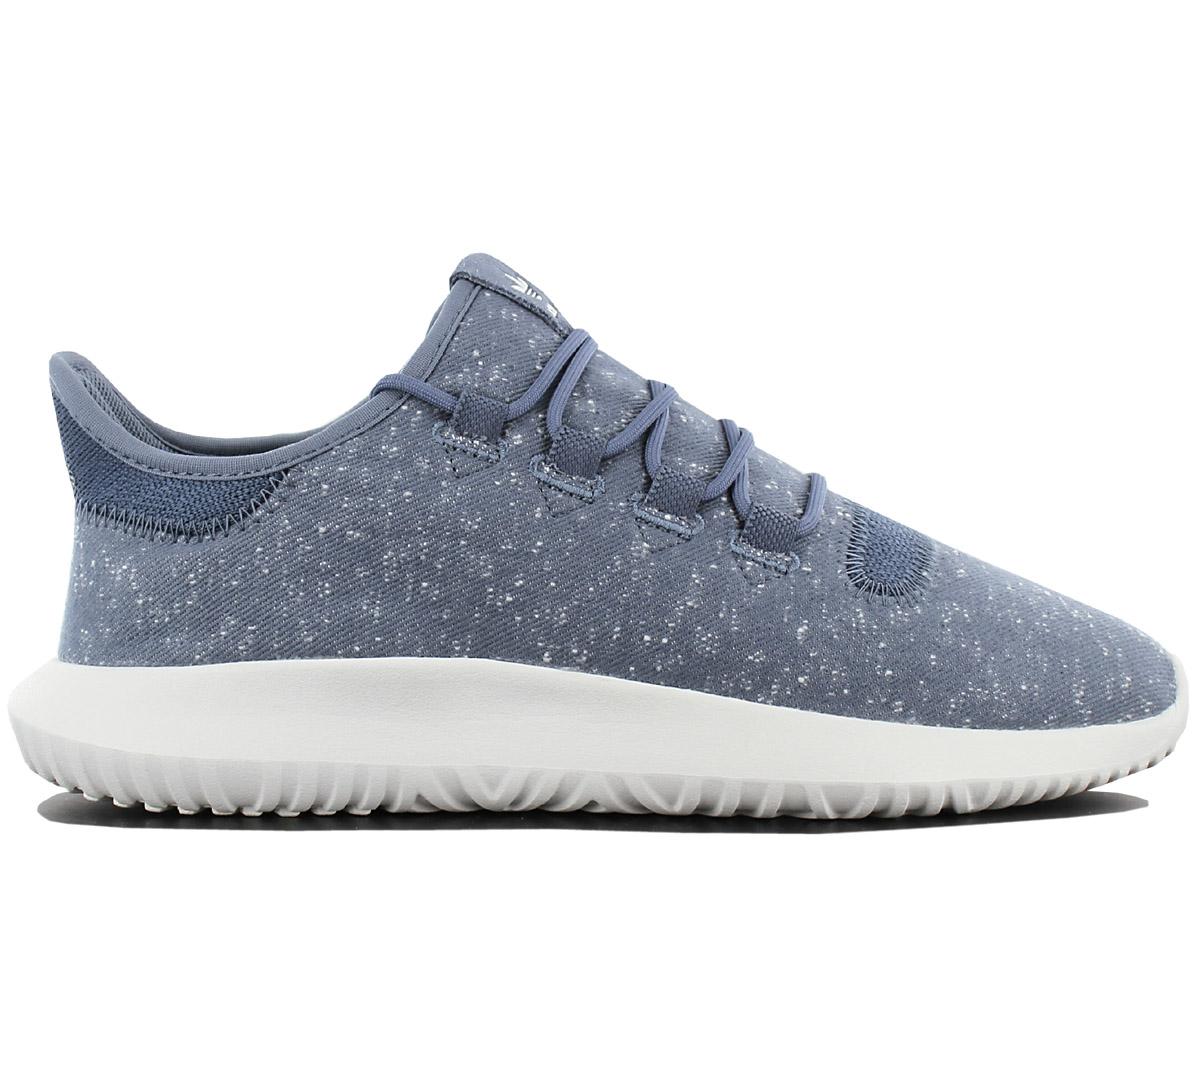 Adidas Originals Tubular Shadow Sneaker Schuhe Blau Turnschuhe